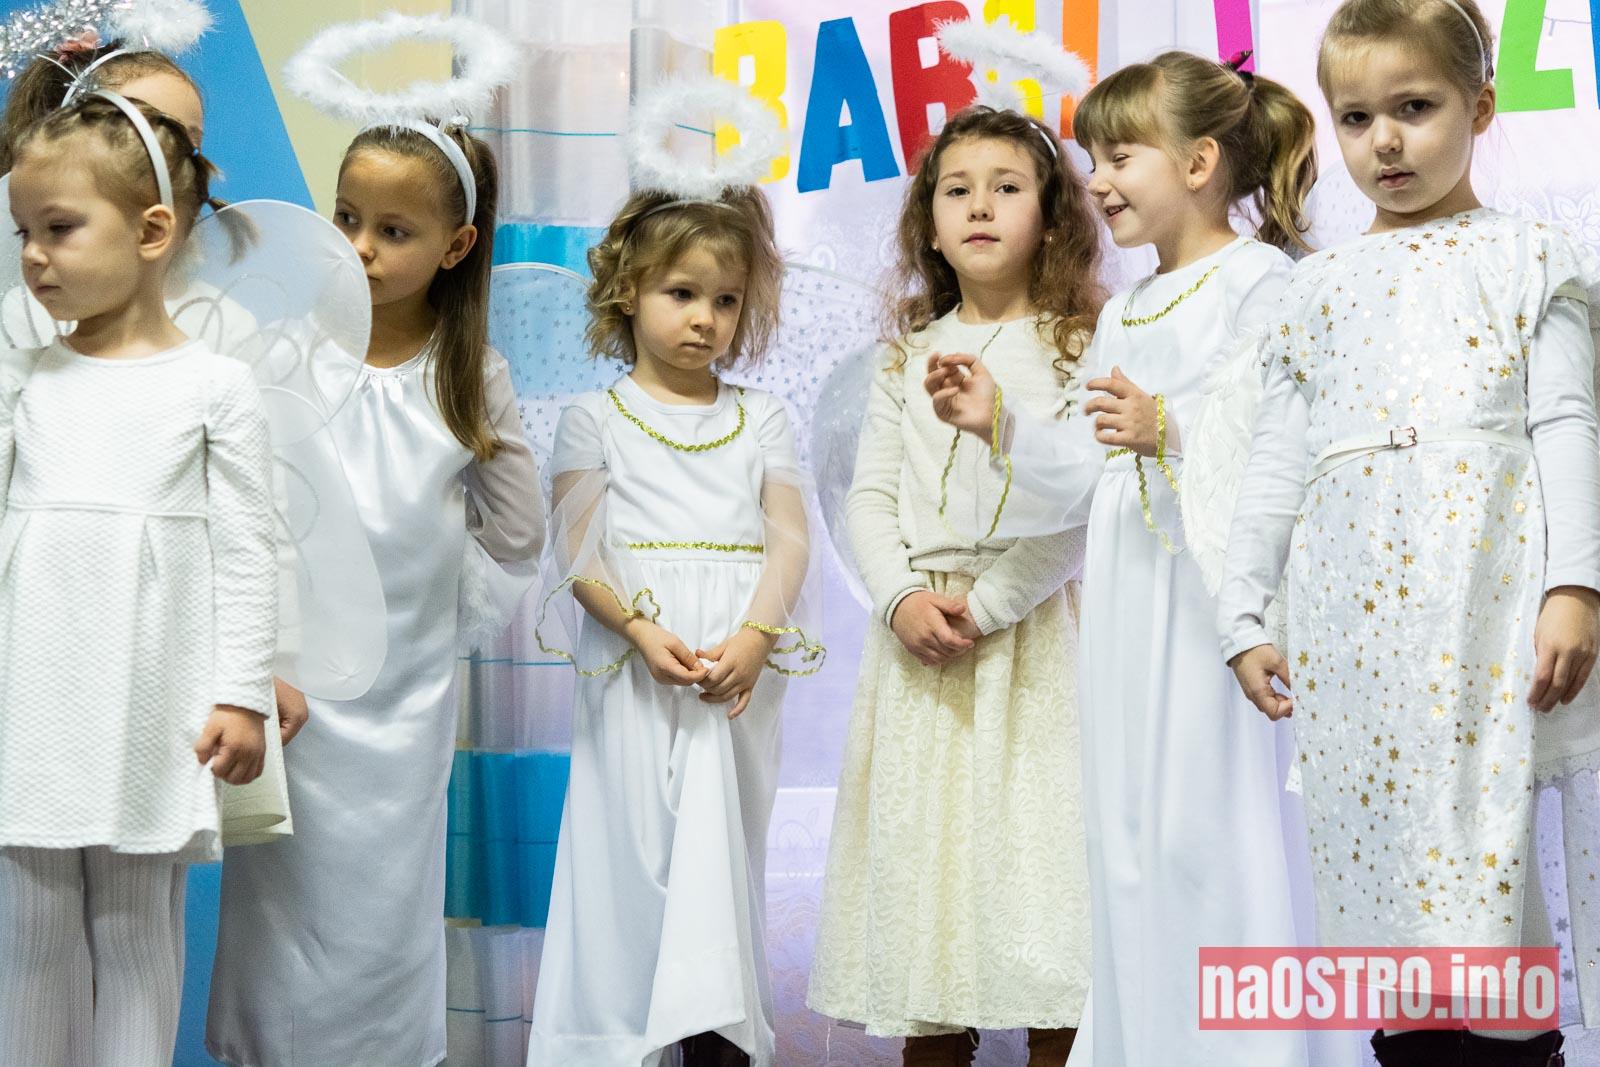 NaOSTRO Zbrucz Ukraina-10009